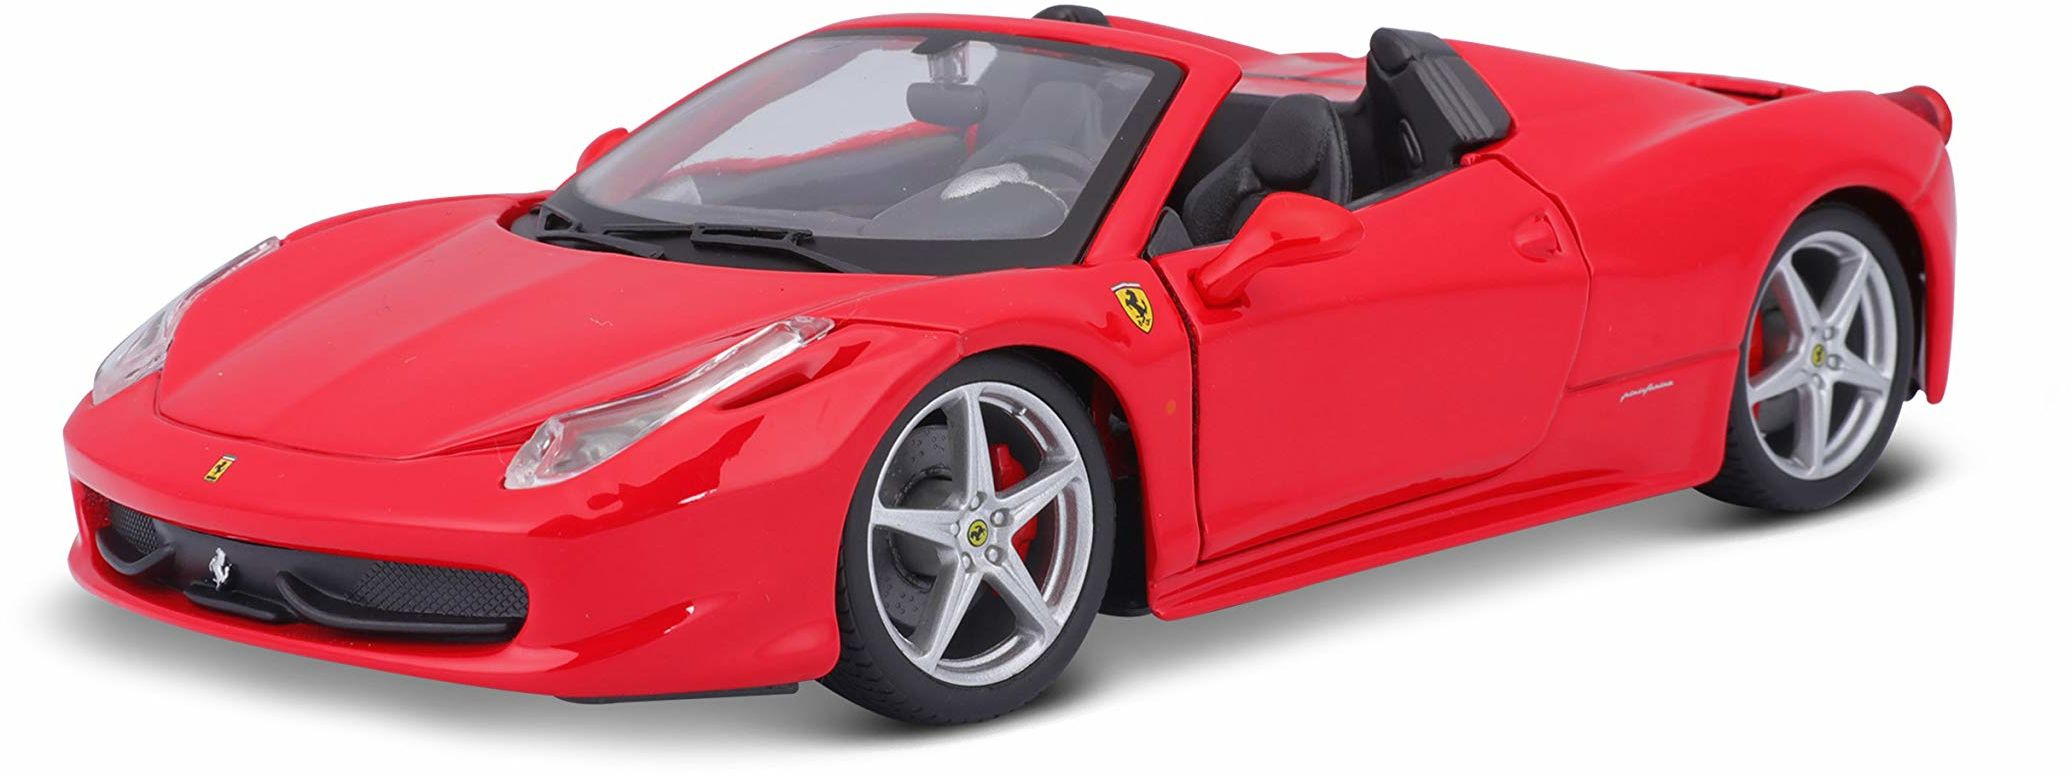 "Bburago B18-26017 Skala 1:24 ""Race And Play Of The Ferrari 458 Spider Sports Car"" Model odlewany ciśnieniowo"